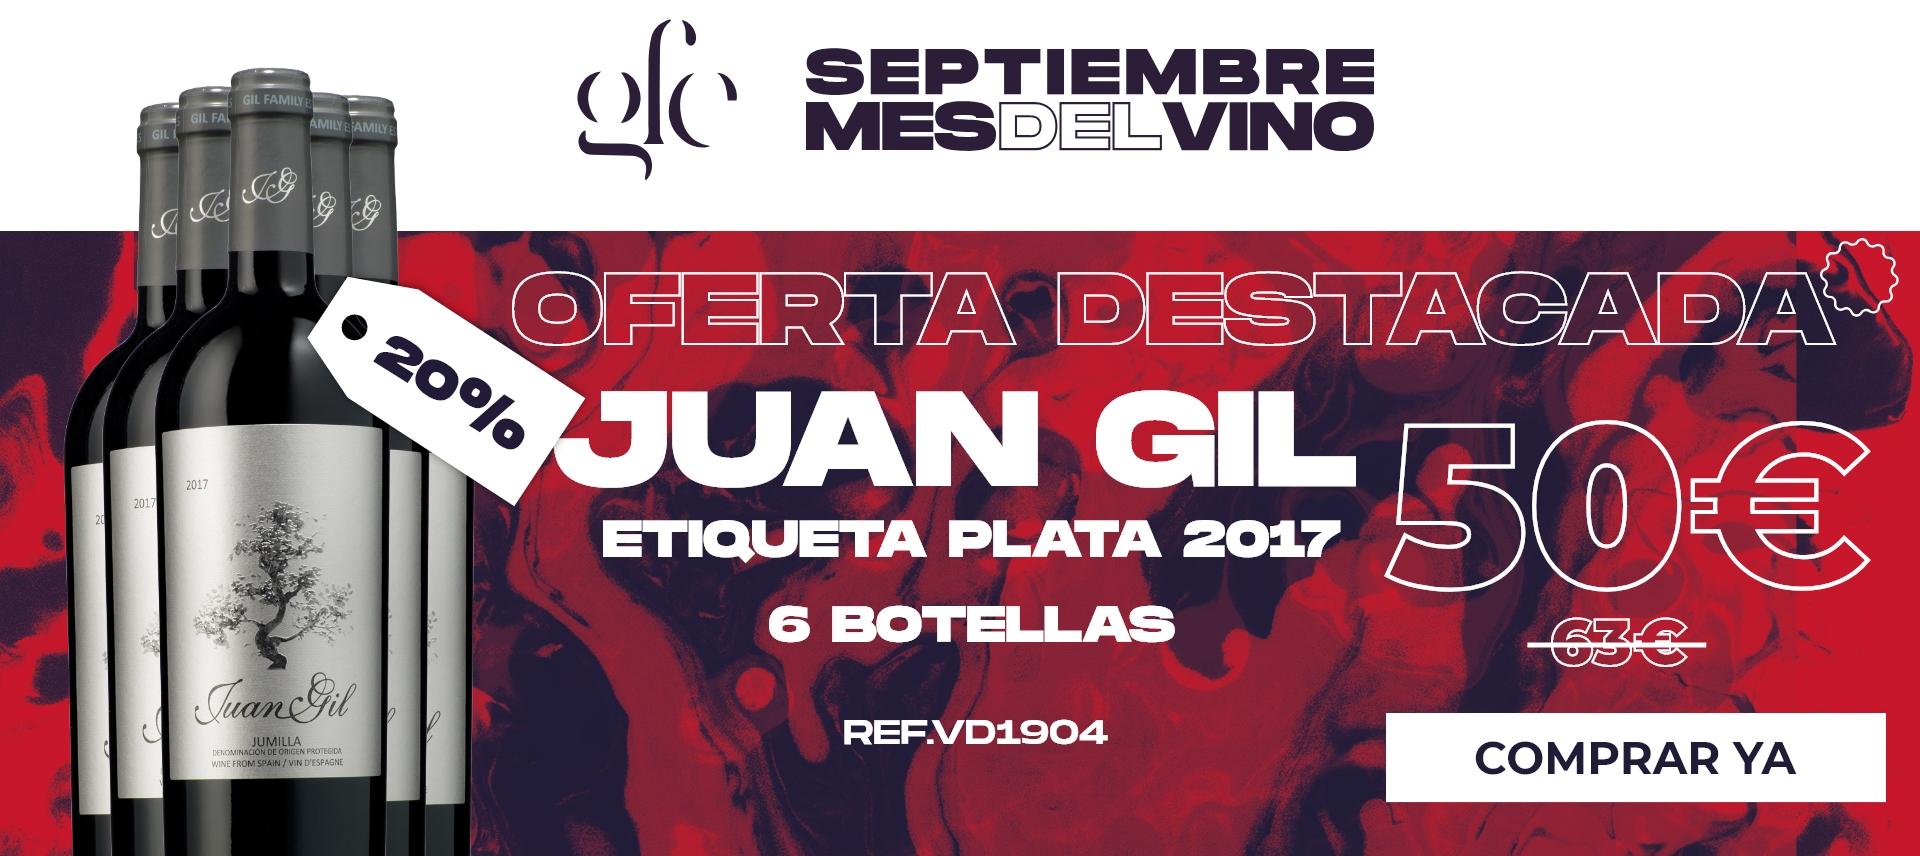 Juan Gil Etiqueta Plata 2017